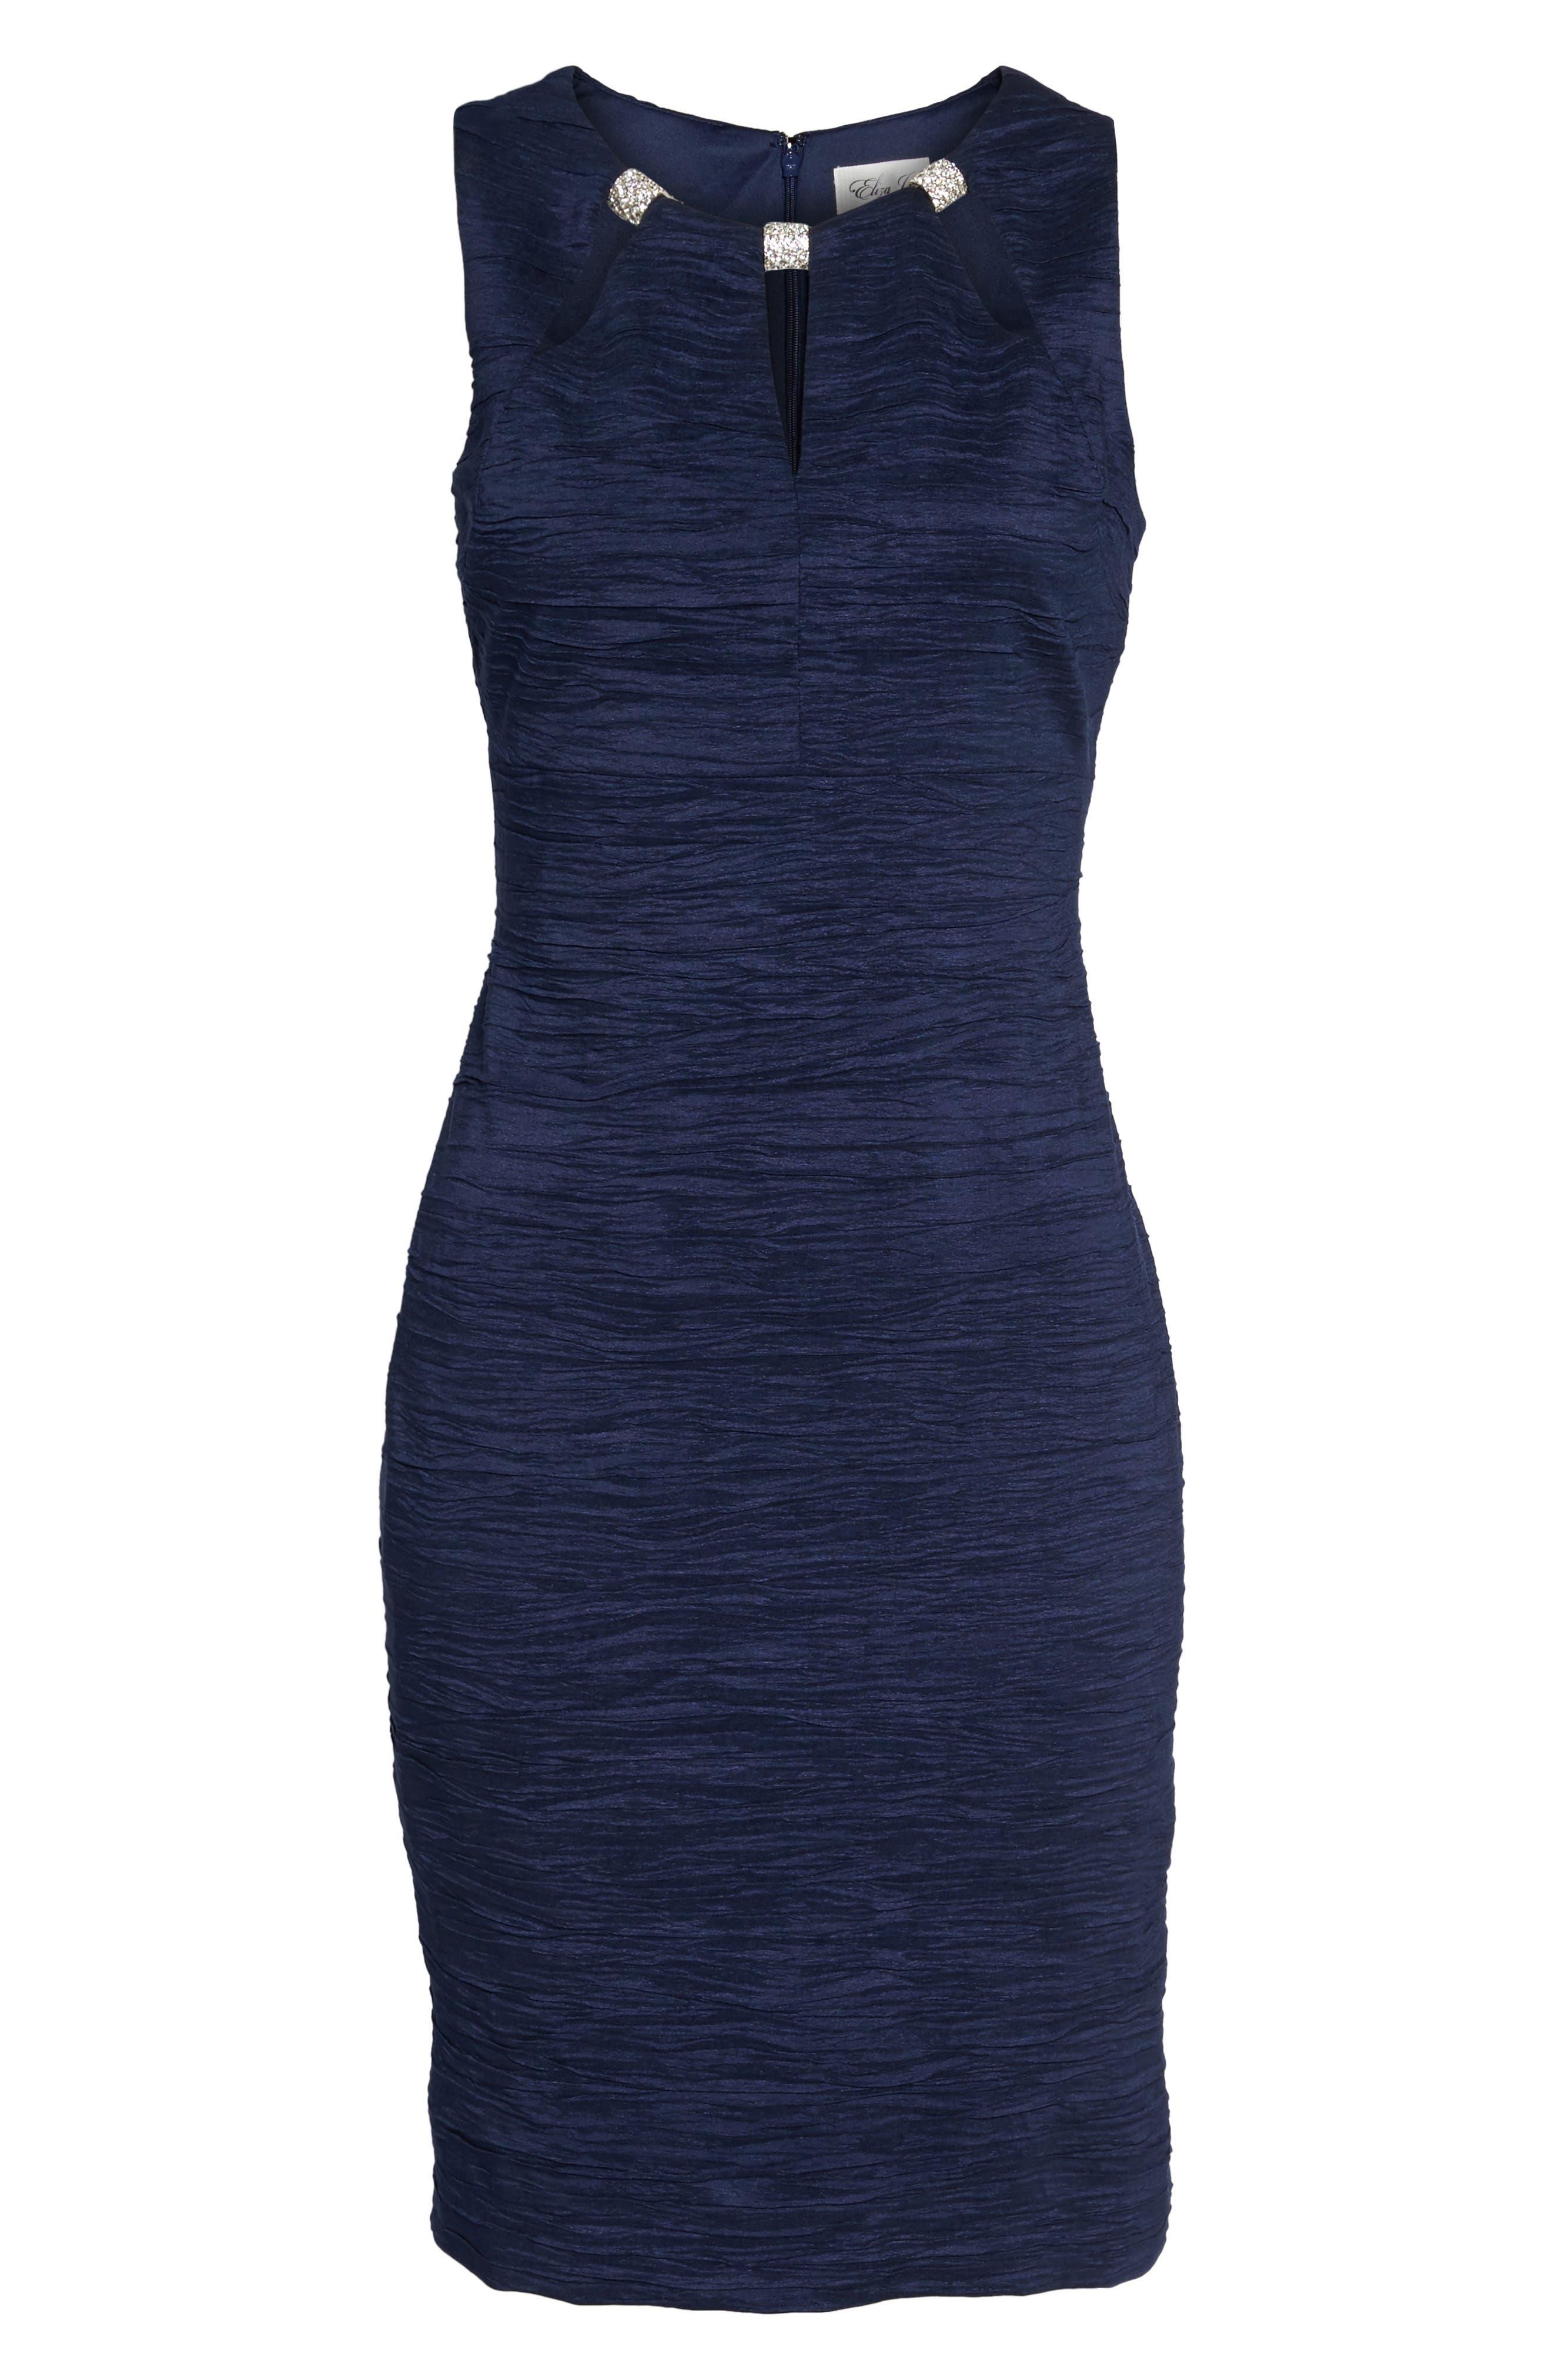 Embellished Cutout Taffeta Sheath Dress,                             Alternate thumbnail 6, color,                             Navy